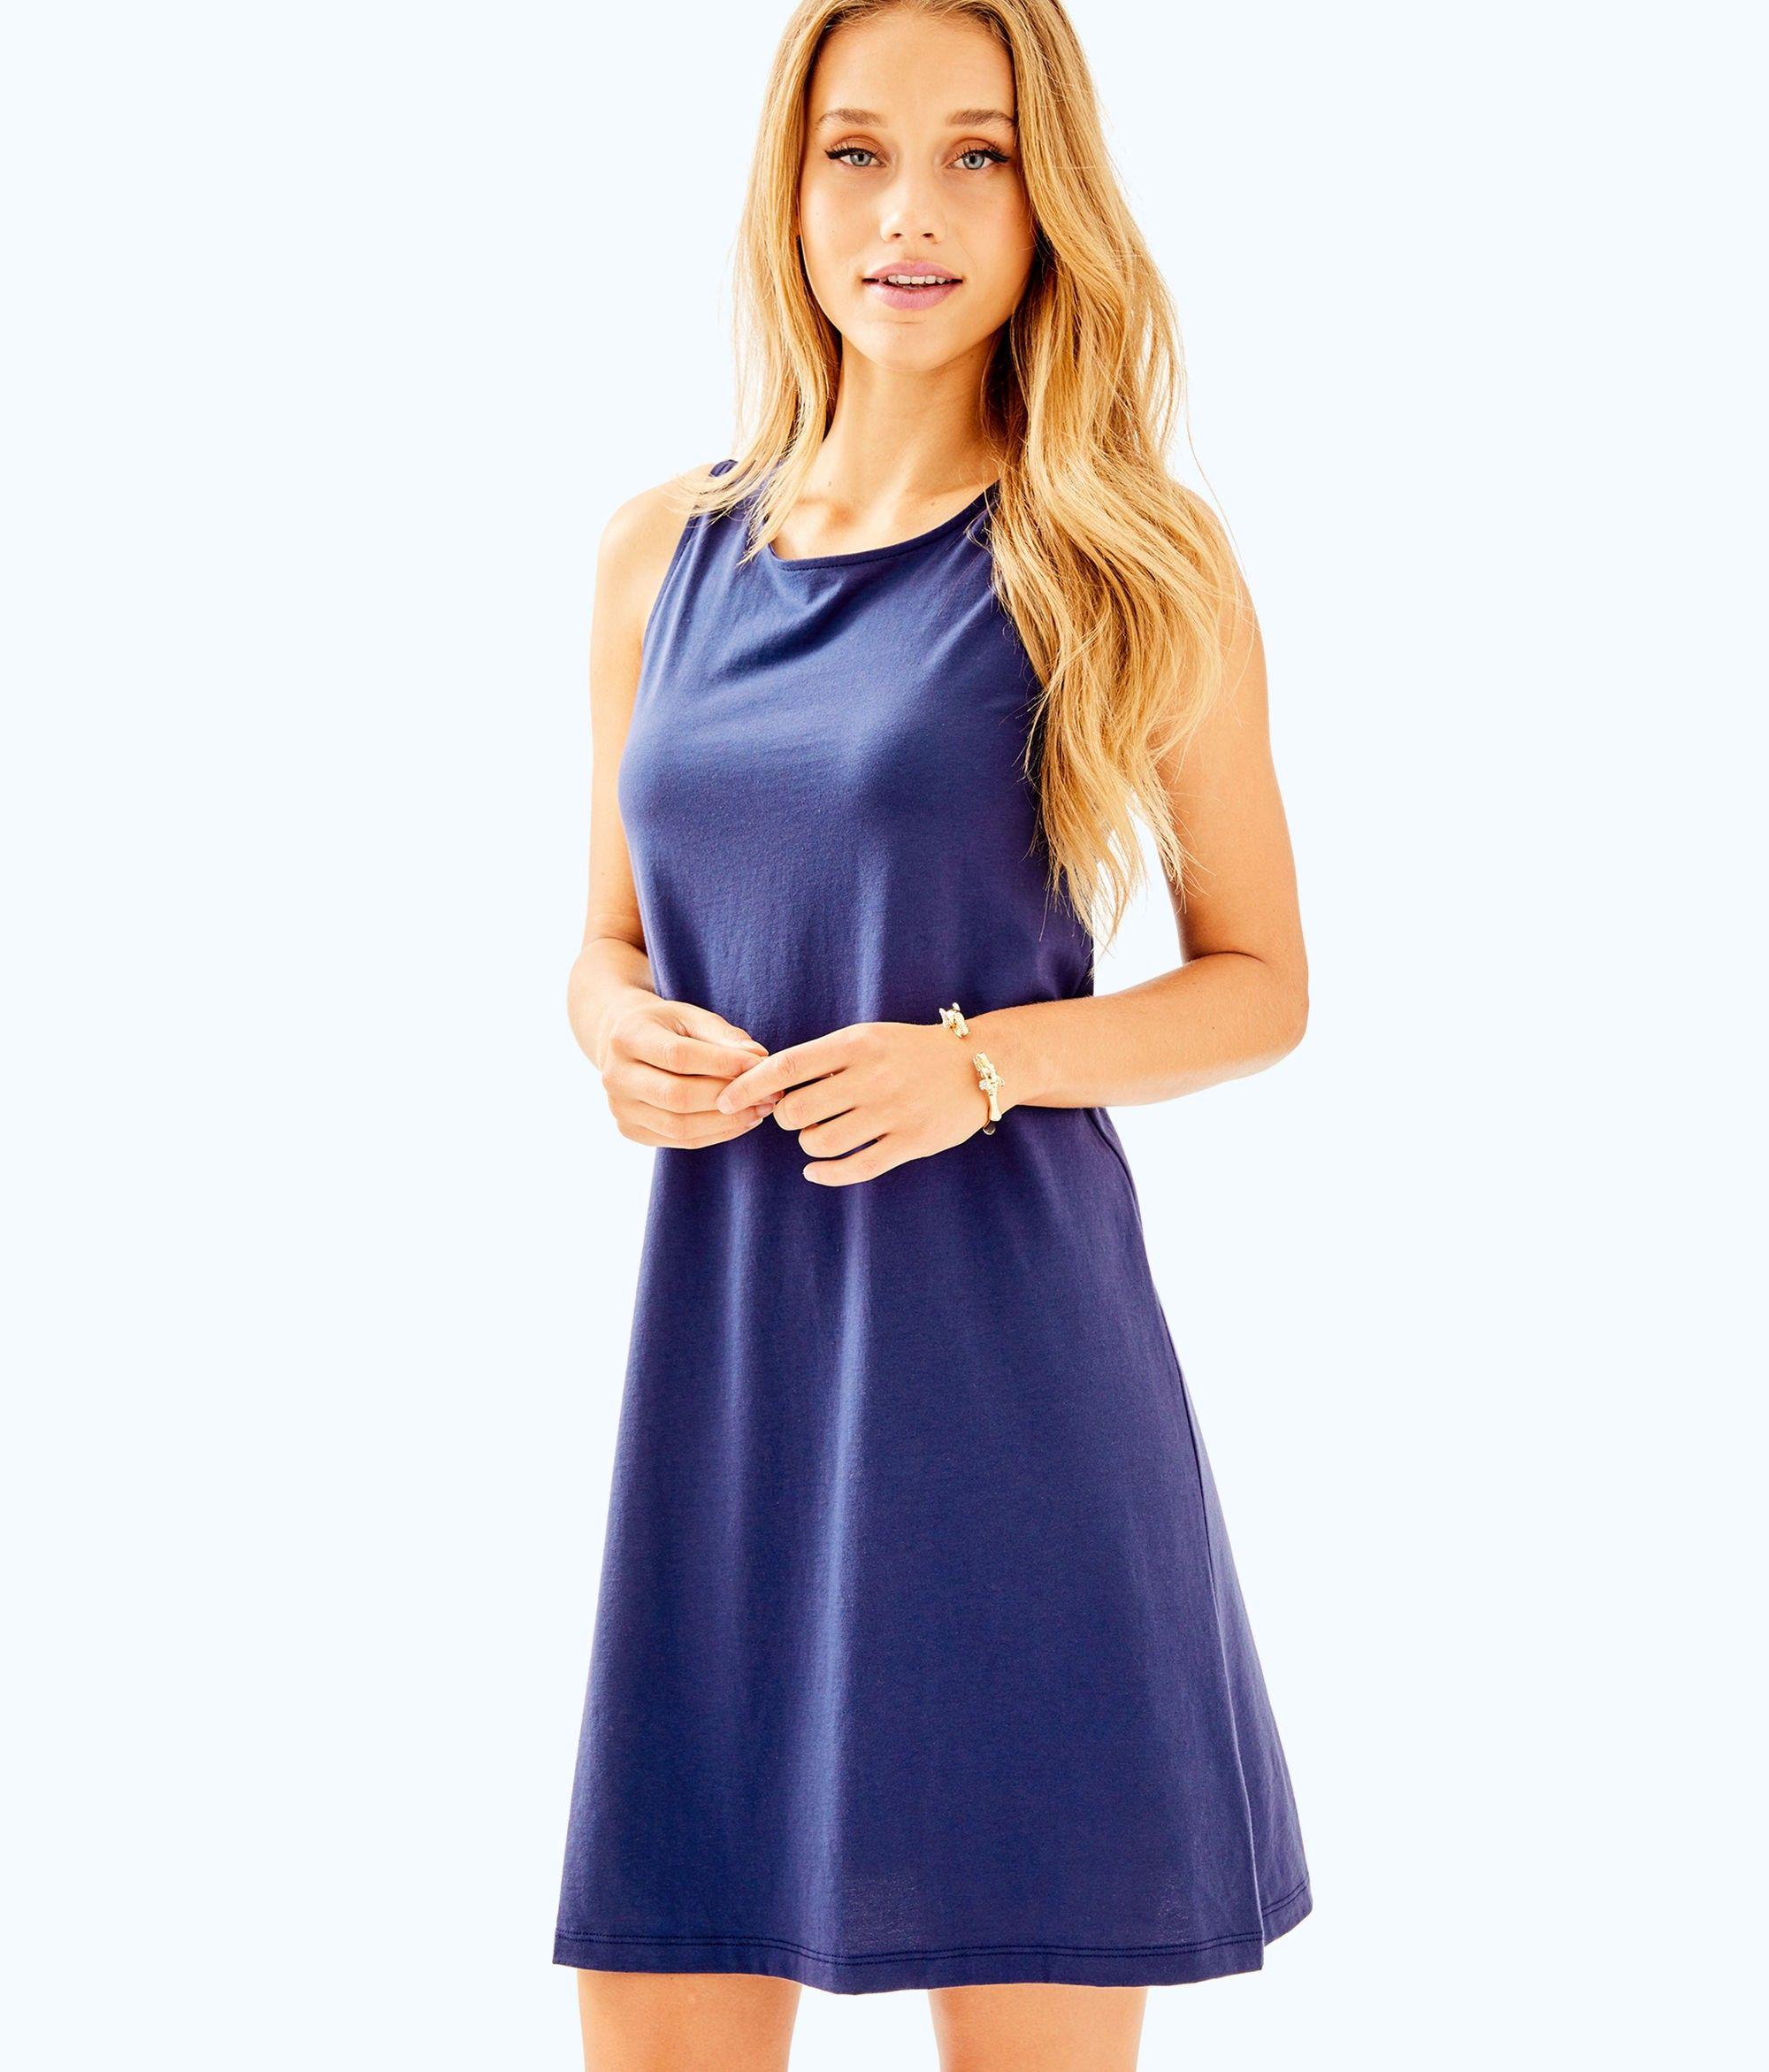 8b6feffdc03 Lilly Pulitzer Kristen Dress - XXS | Products | Dresses, Lilly ...